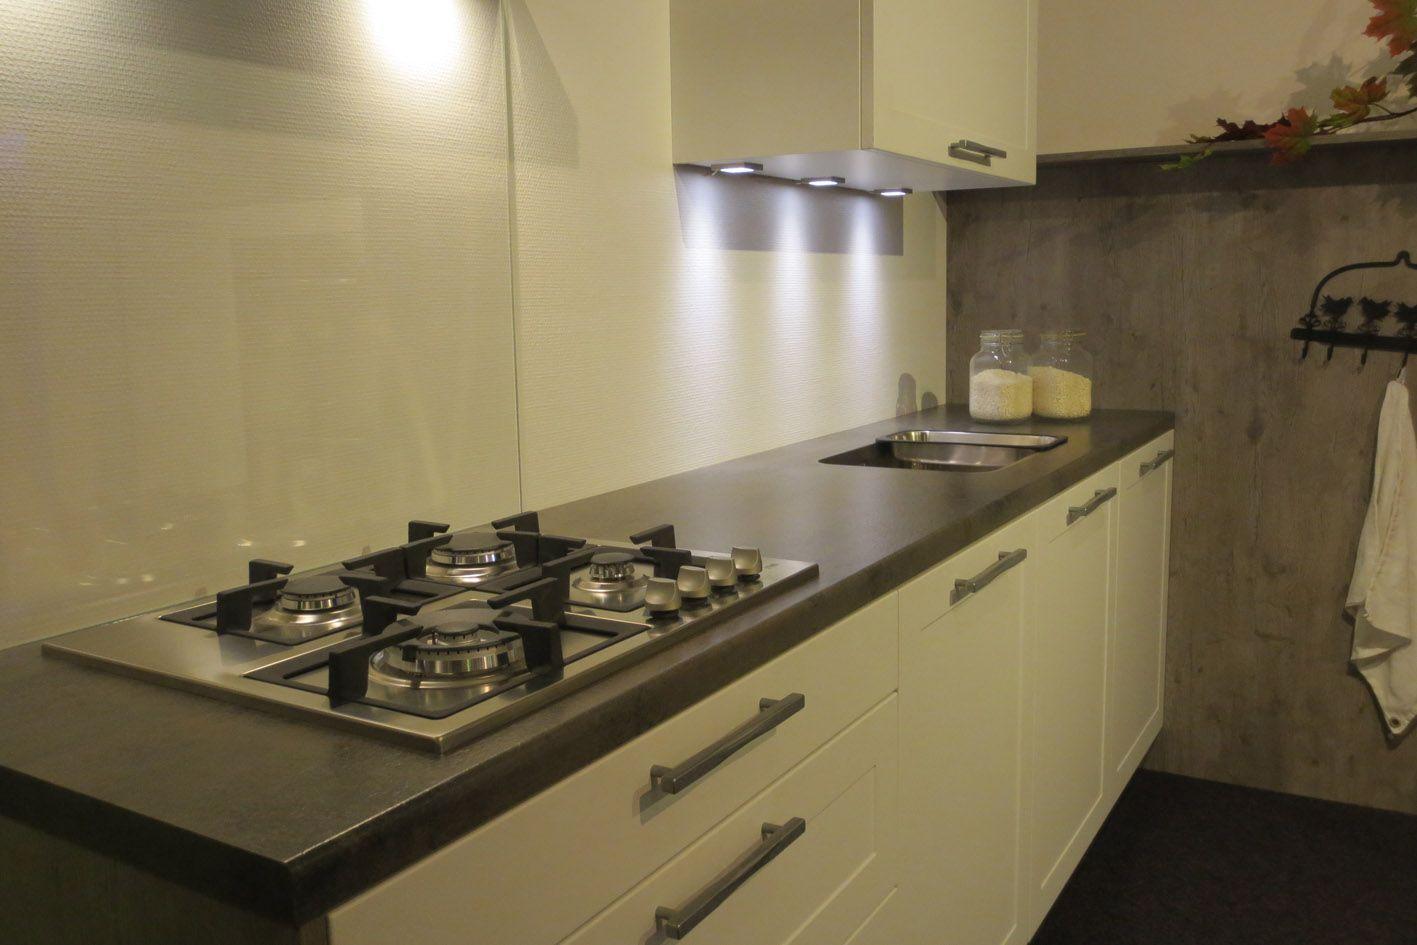 Goedkope Keuken Kastenwand : Kwaliteit Keukens Informatie Over Kwaliteit Bij Keukens Share The